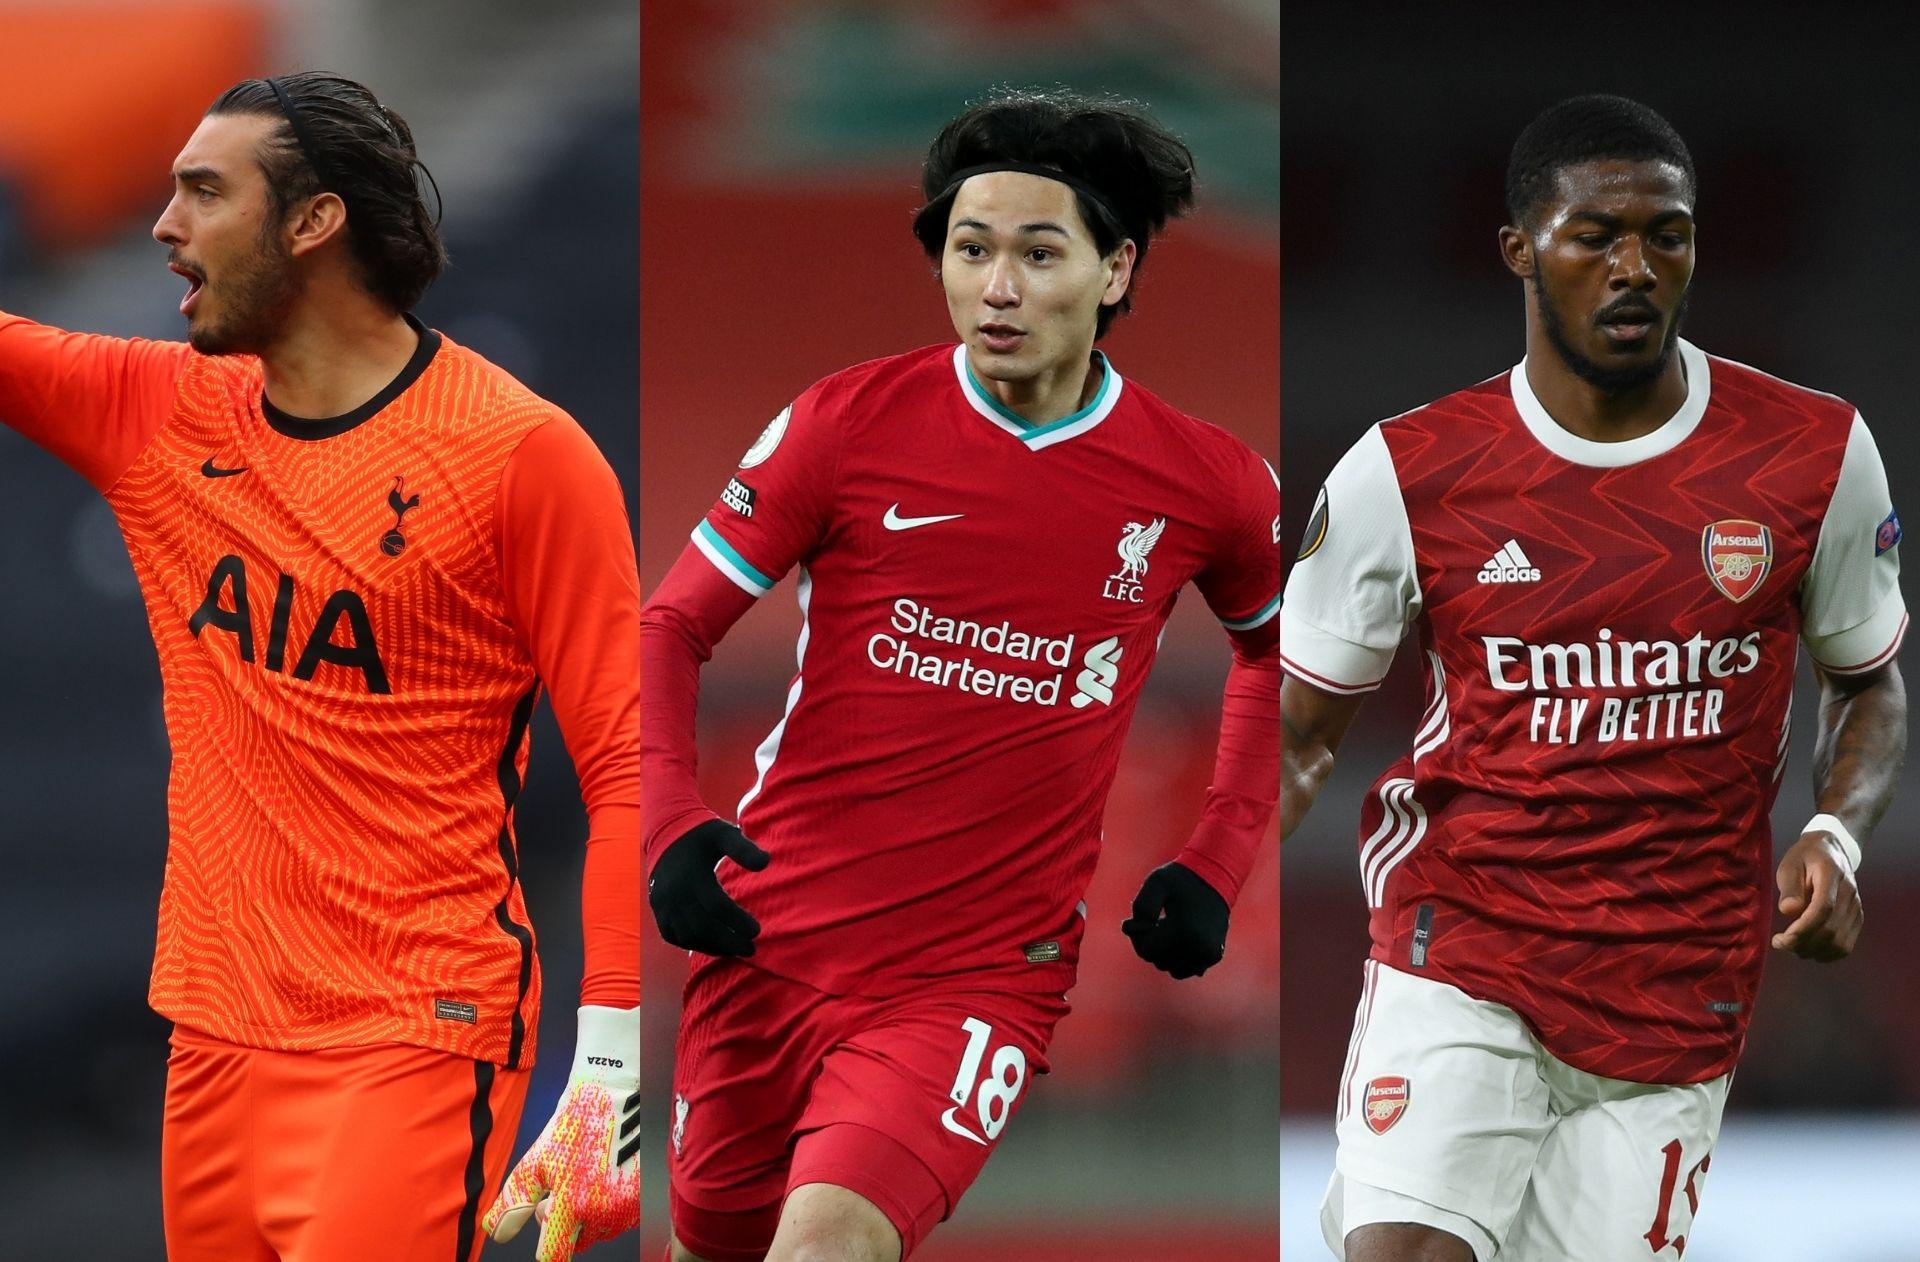 Paulo Gazzaniga of Tottenham, Takumi Minamino of Liverpool, Ainsley Maitland-Niles of Arsenal